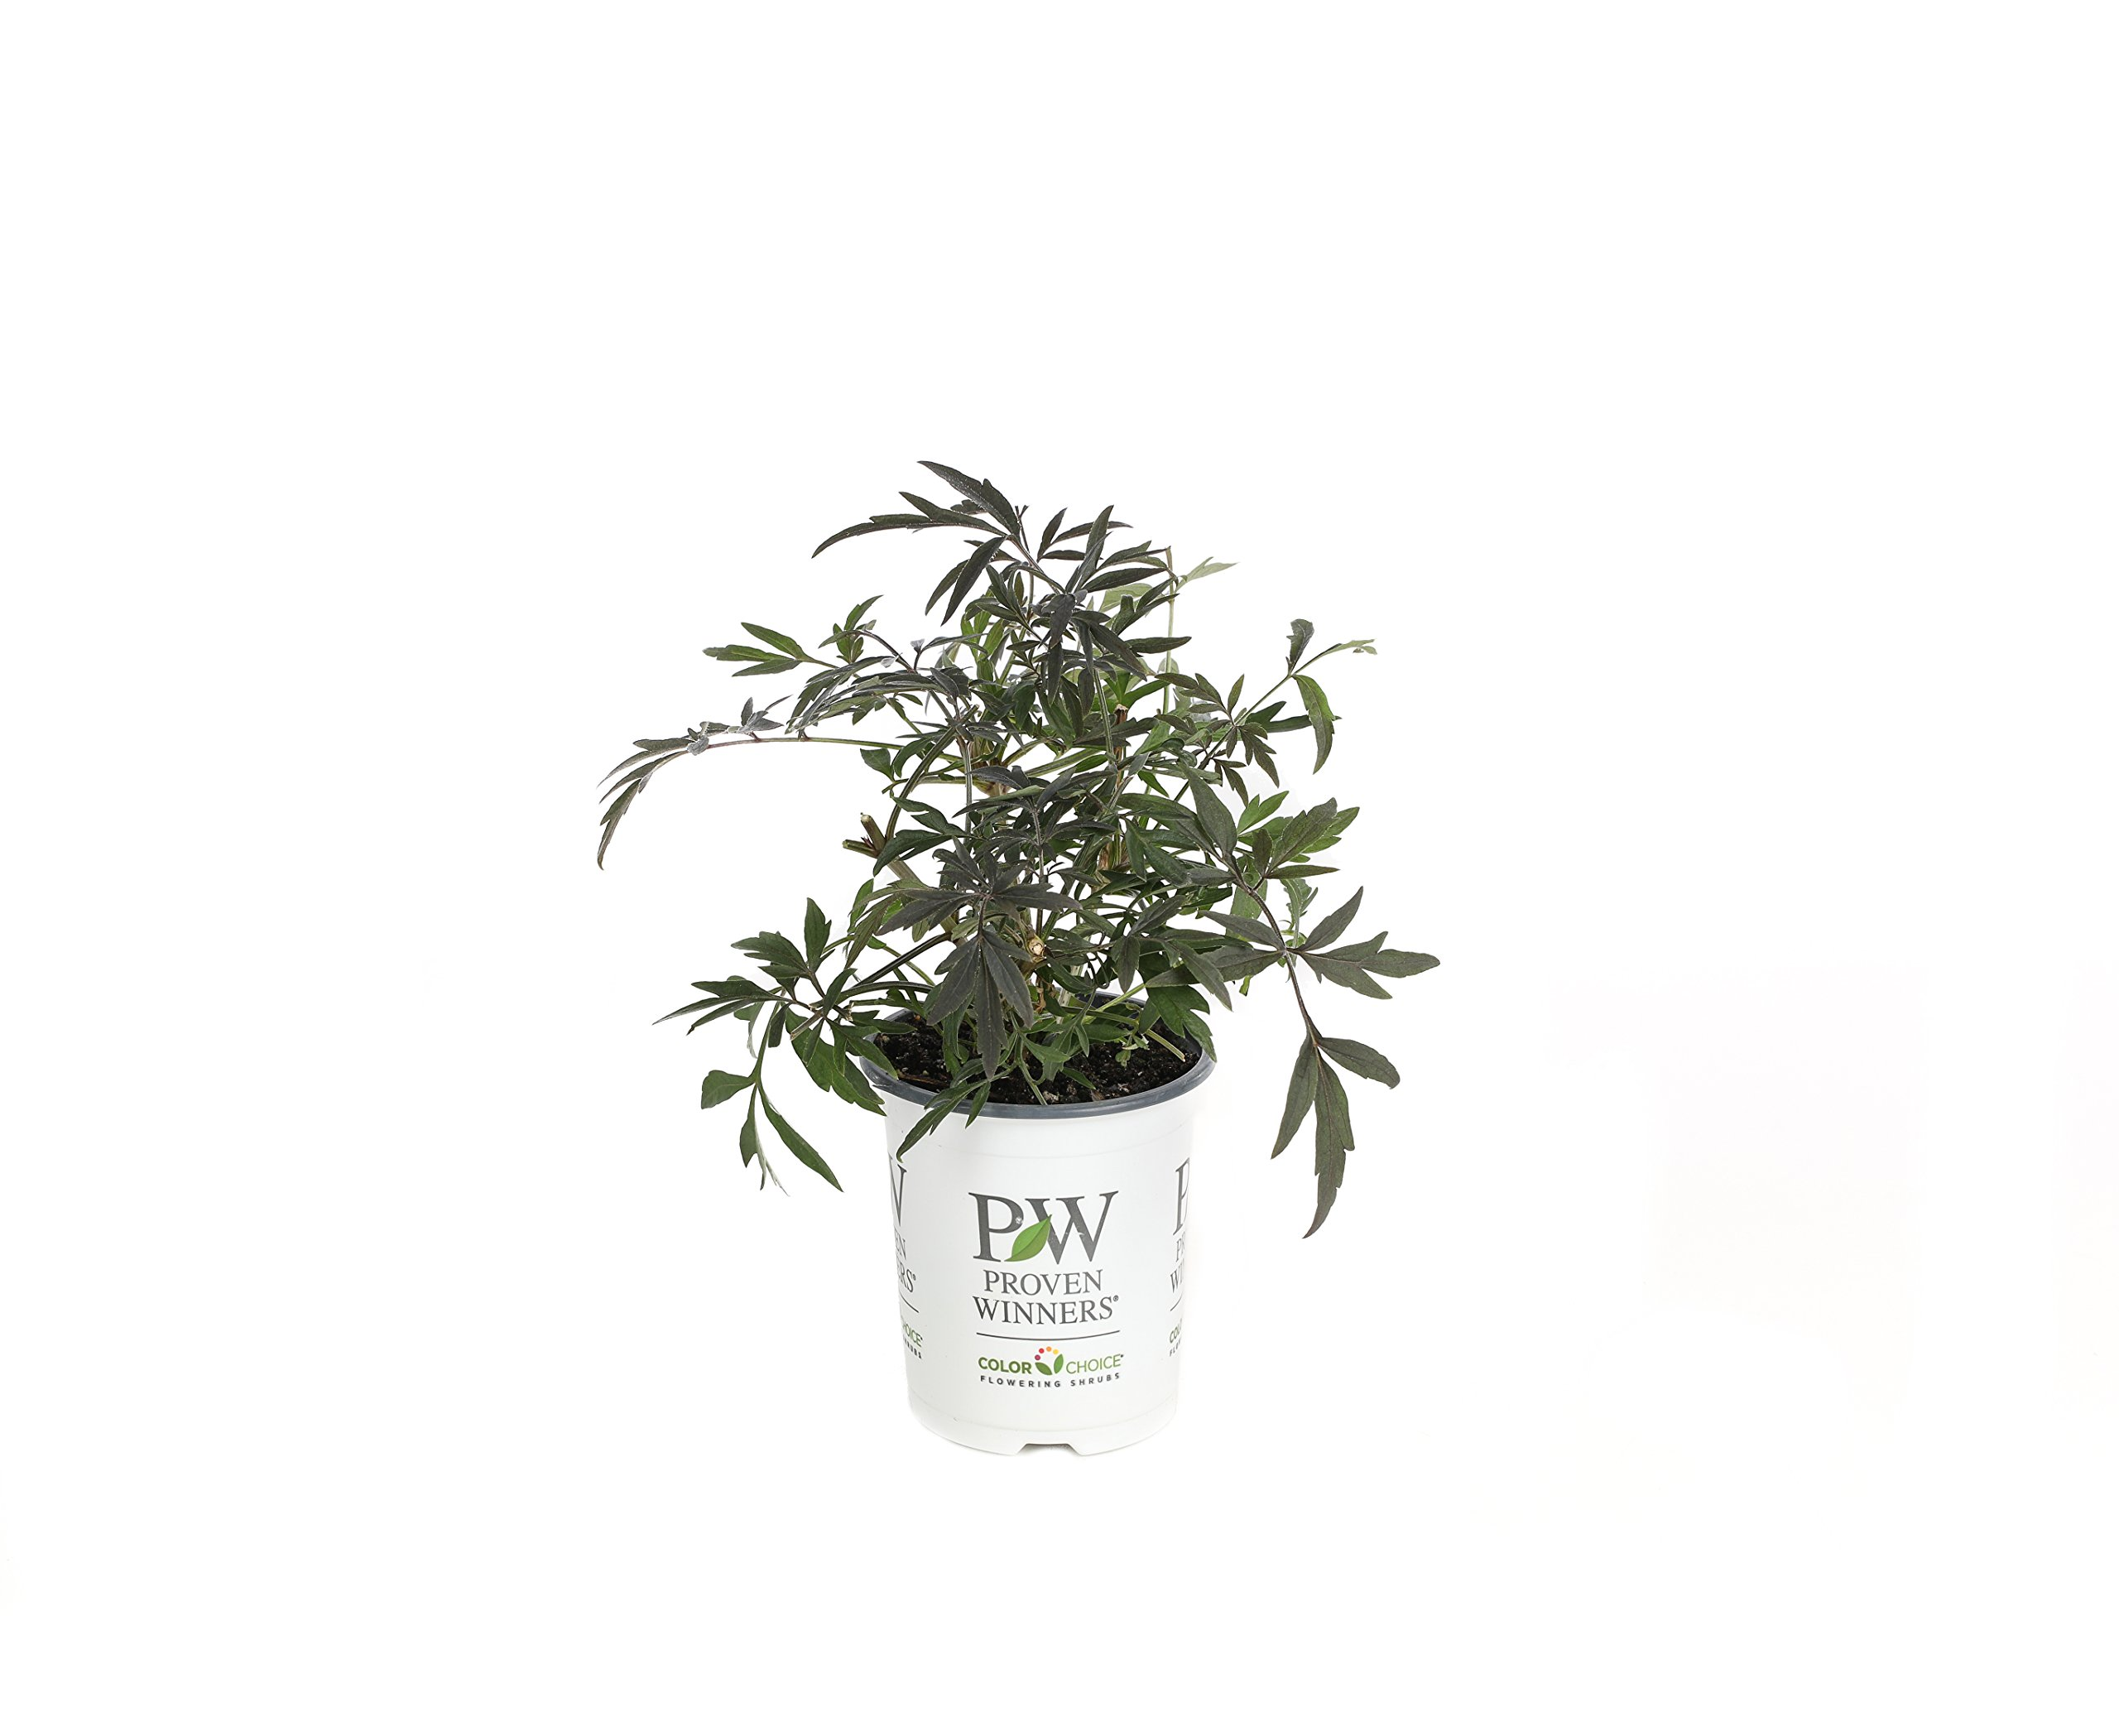 Black Lace Elderberry (Sambucus) Live Shrub, Pink Flowers, 4.5 in. Quart